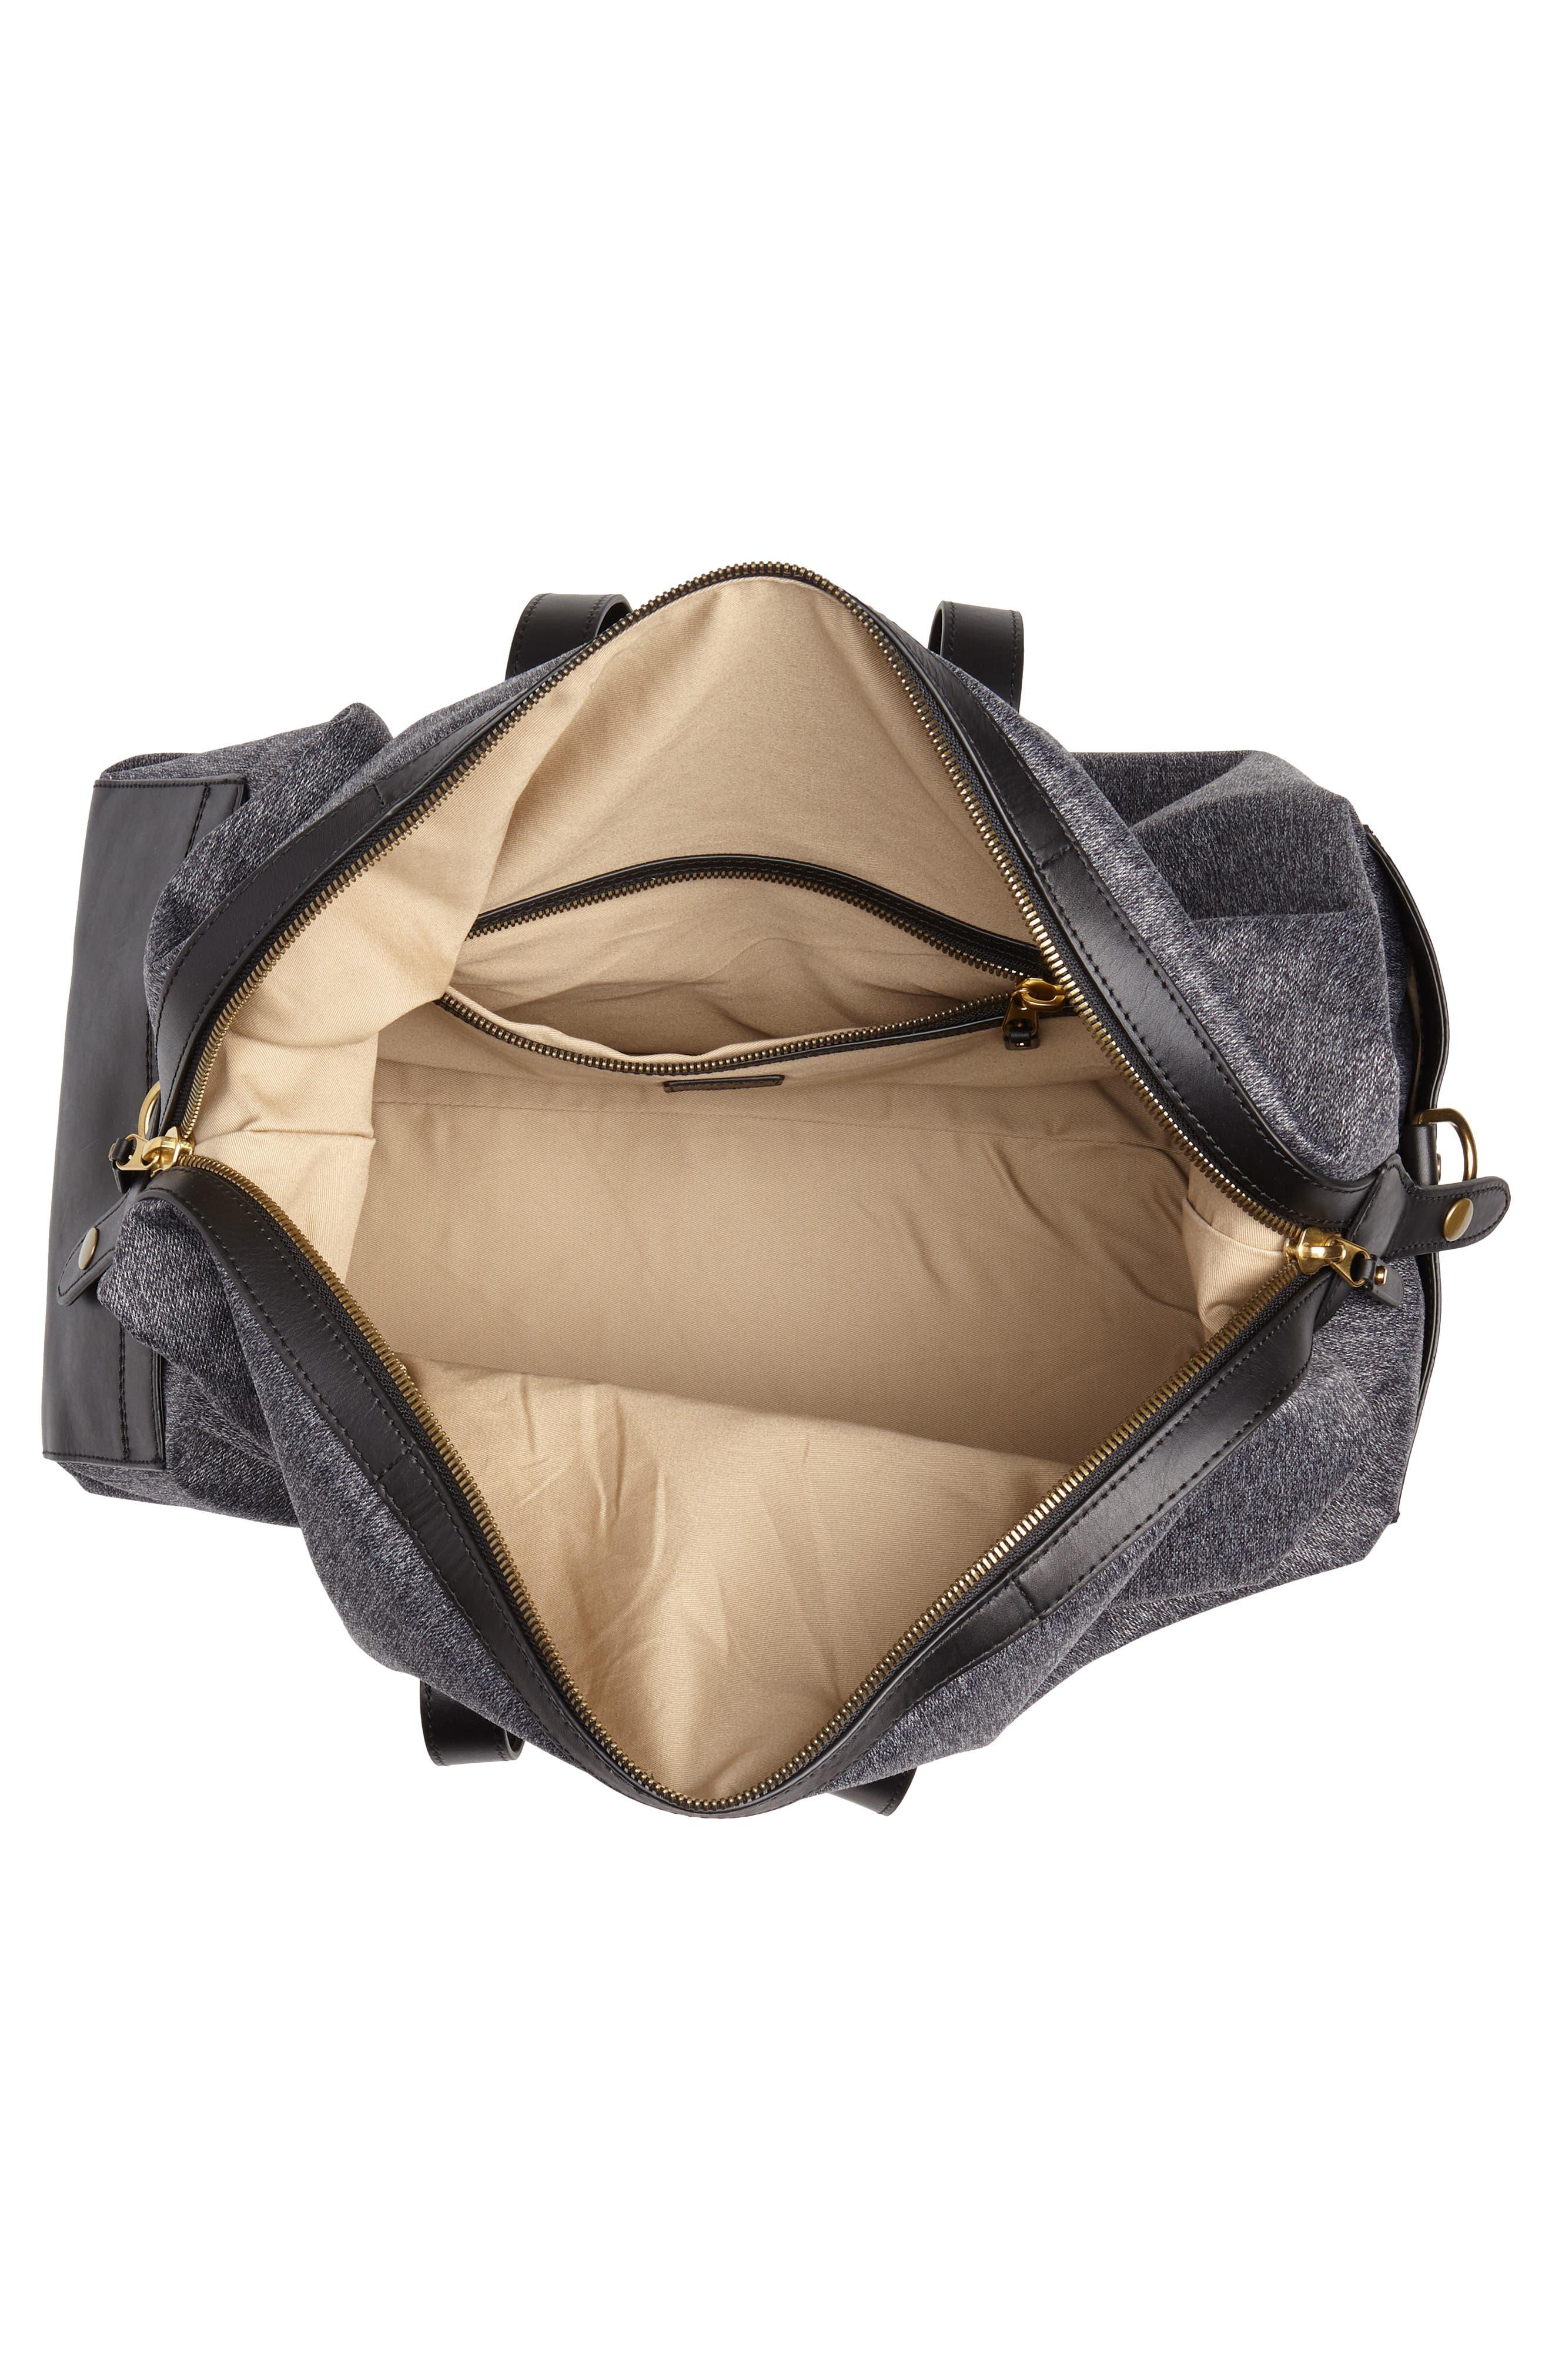 Oar Stripe Weekend Bag,                             Alternate thumbnail 4, color,                             001